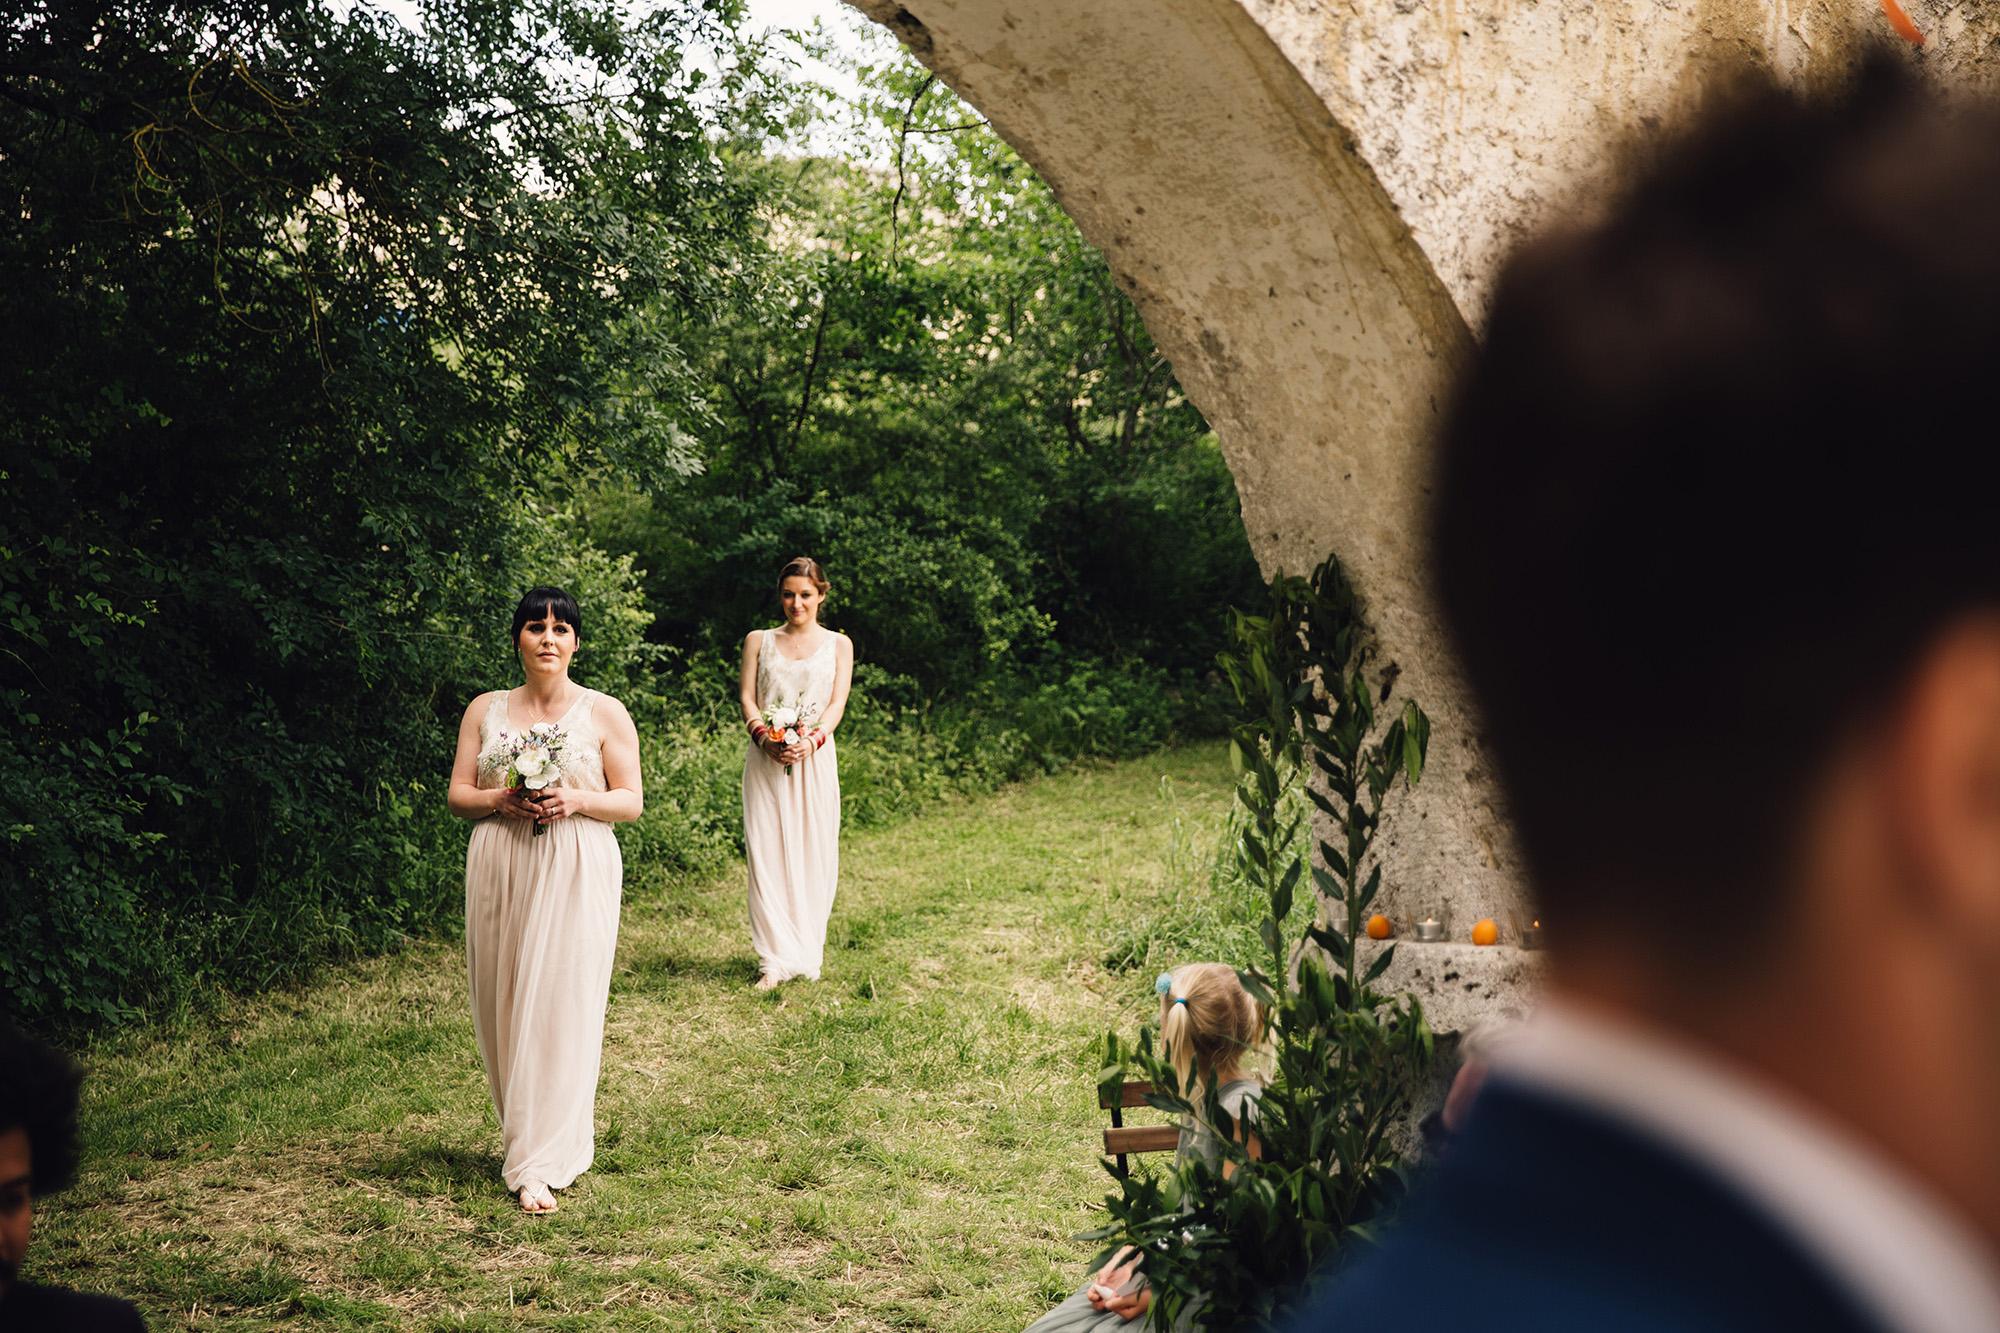 Hannah-Bespoke-Bridesmaids-Bohemian-French-Wedding-Gold-Lace-Susanna-Greening-Designs-Matlock-Derbyshire-6